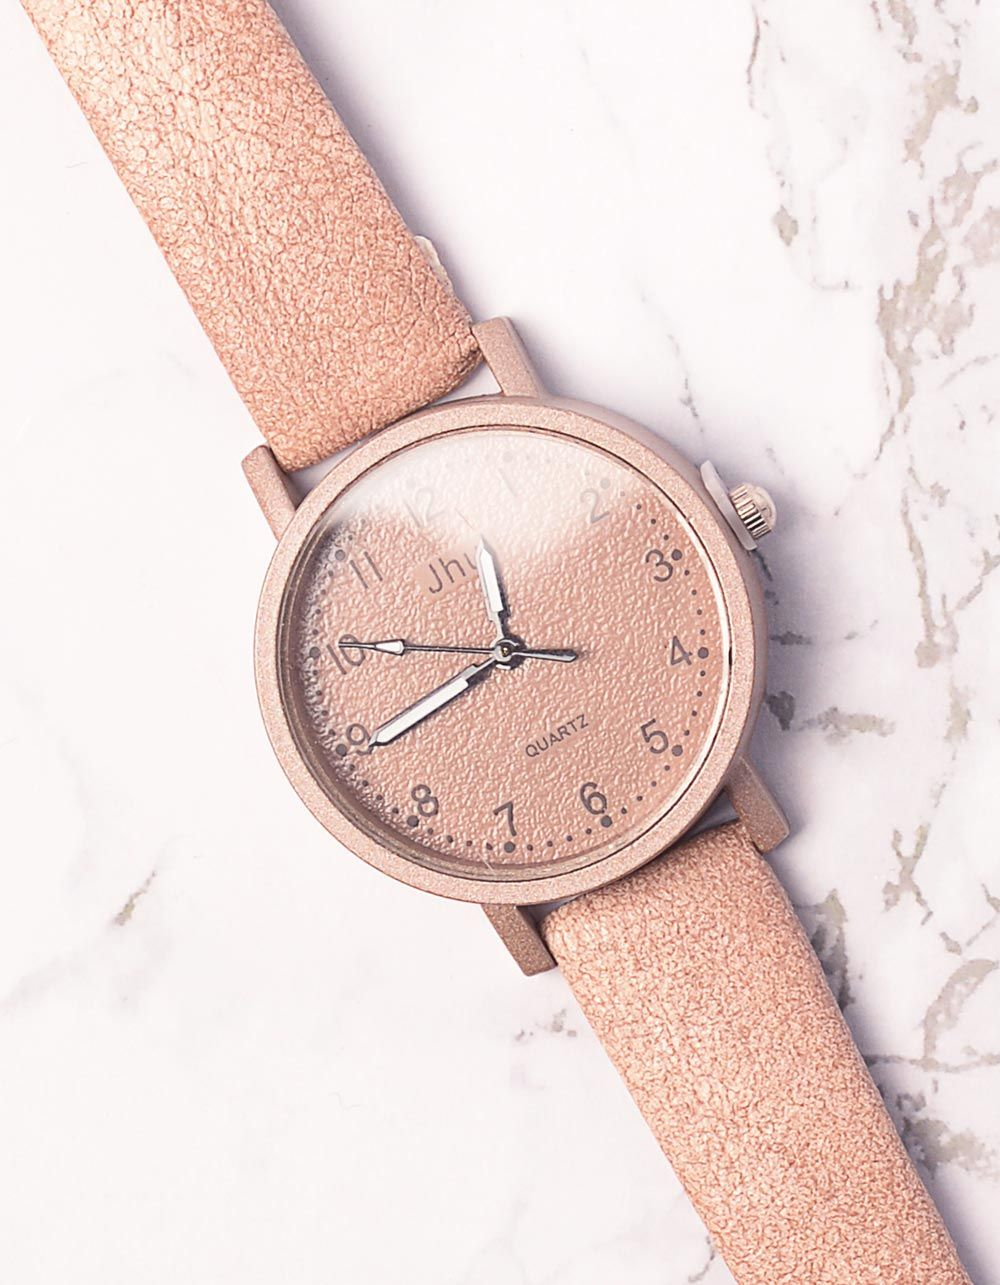 Годинник на руку з круглим циферблатом | 240467-12-XX